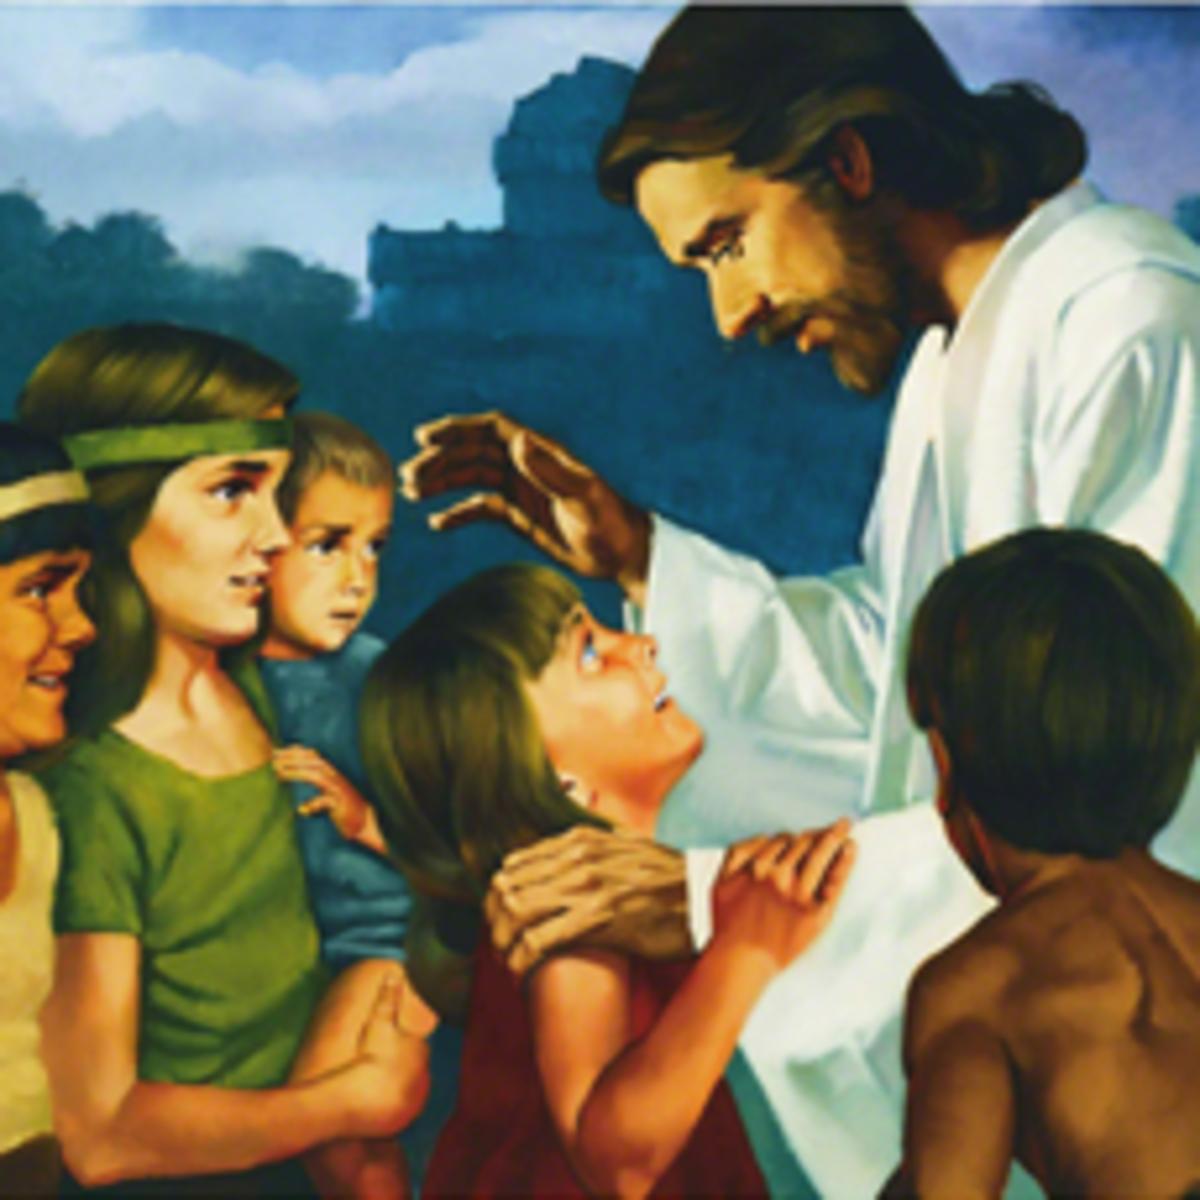 Jesus Christ and the Children